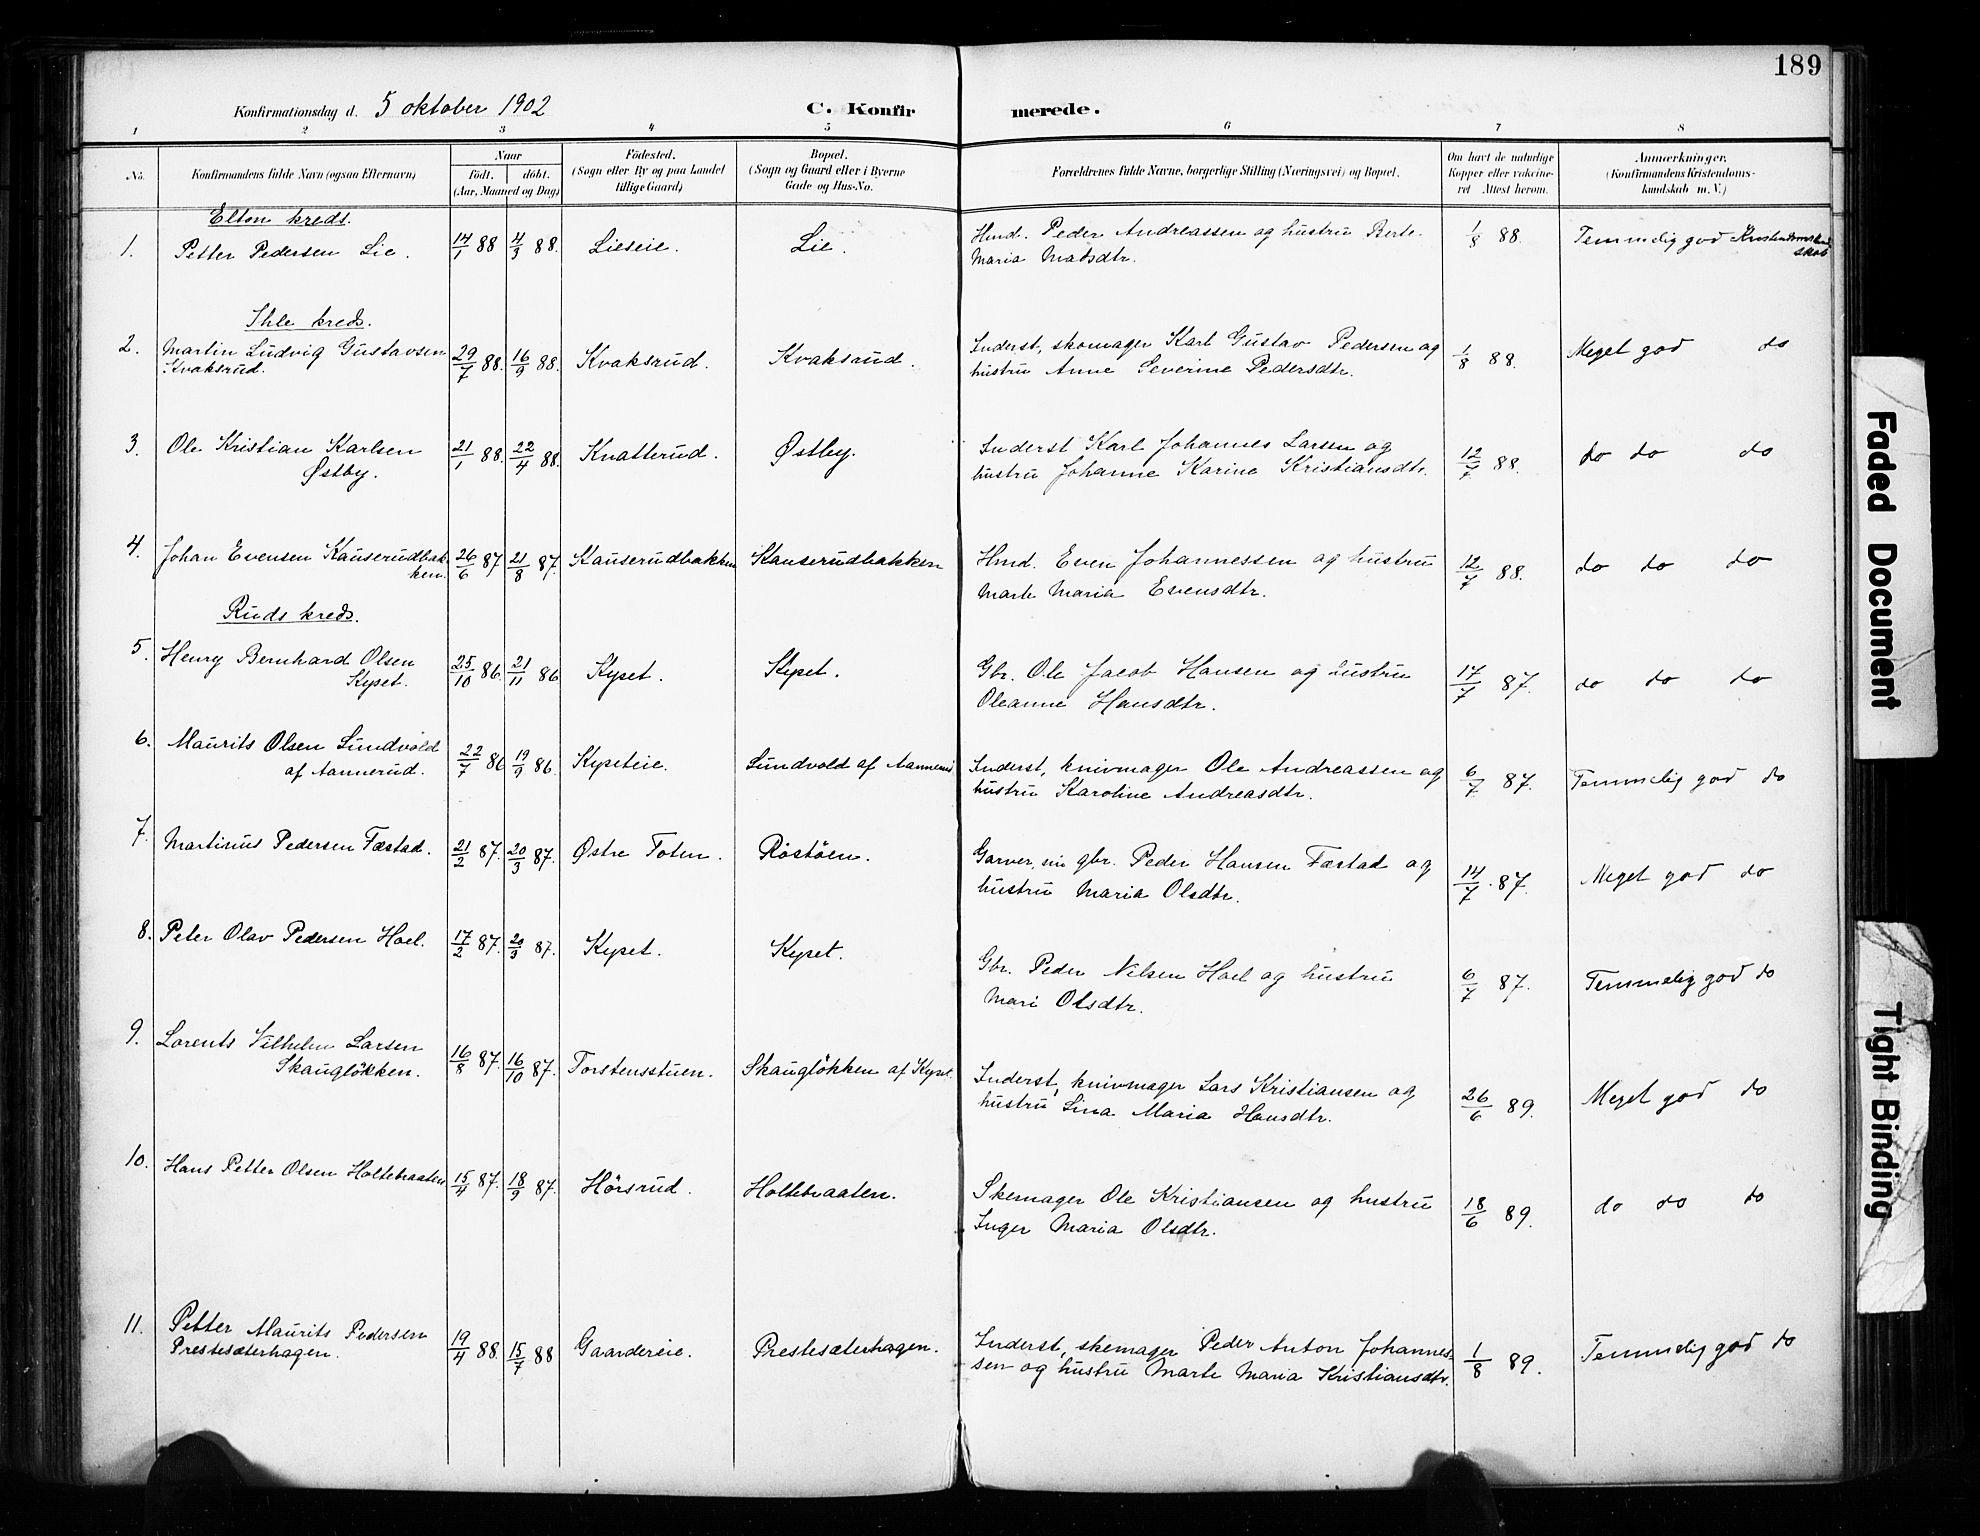 SAH, Vestre Toten prestekontor, H/Ha/Haa/L0011: Ministerialbok nr. 11, 1895-1906, s. 189